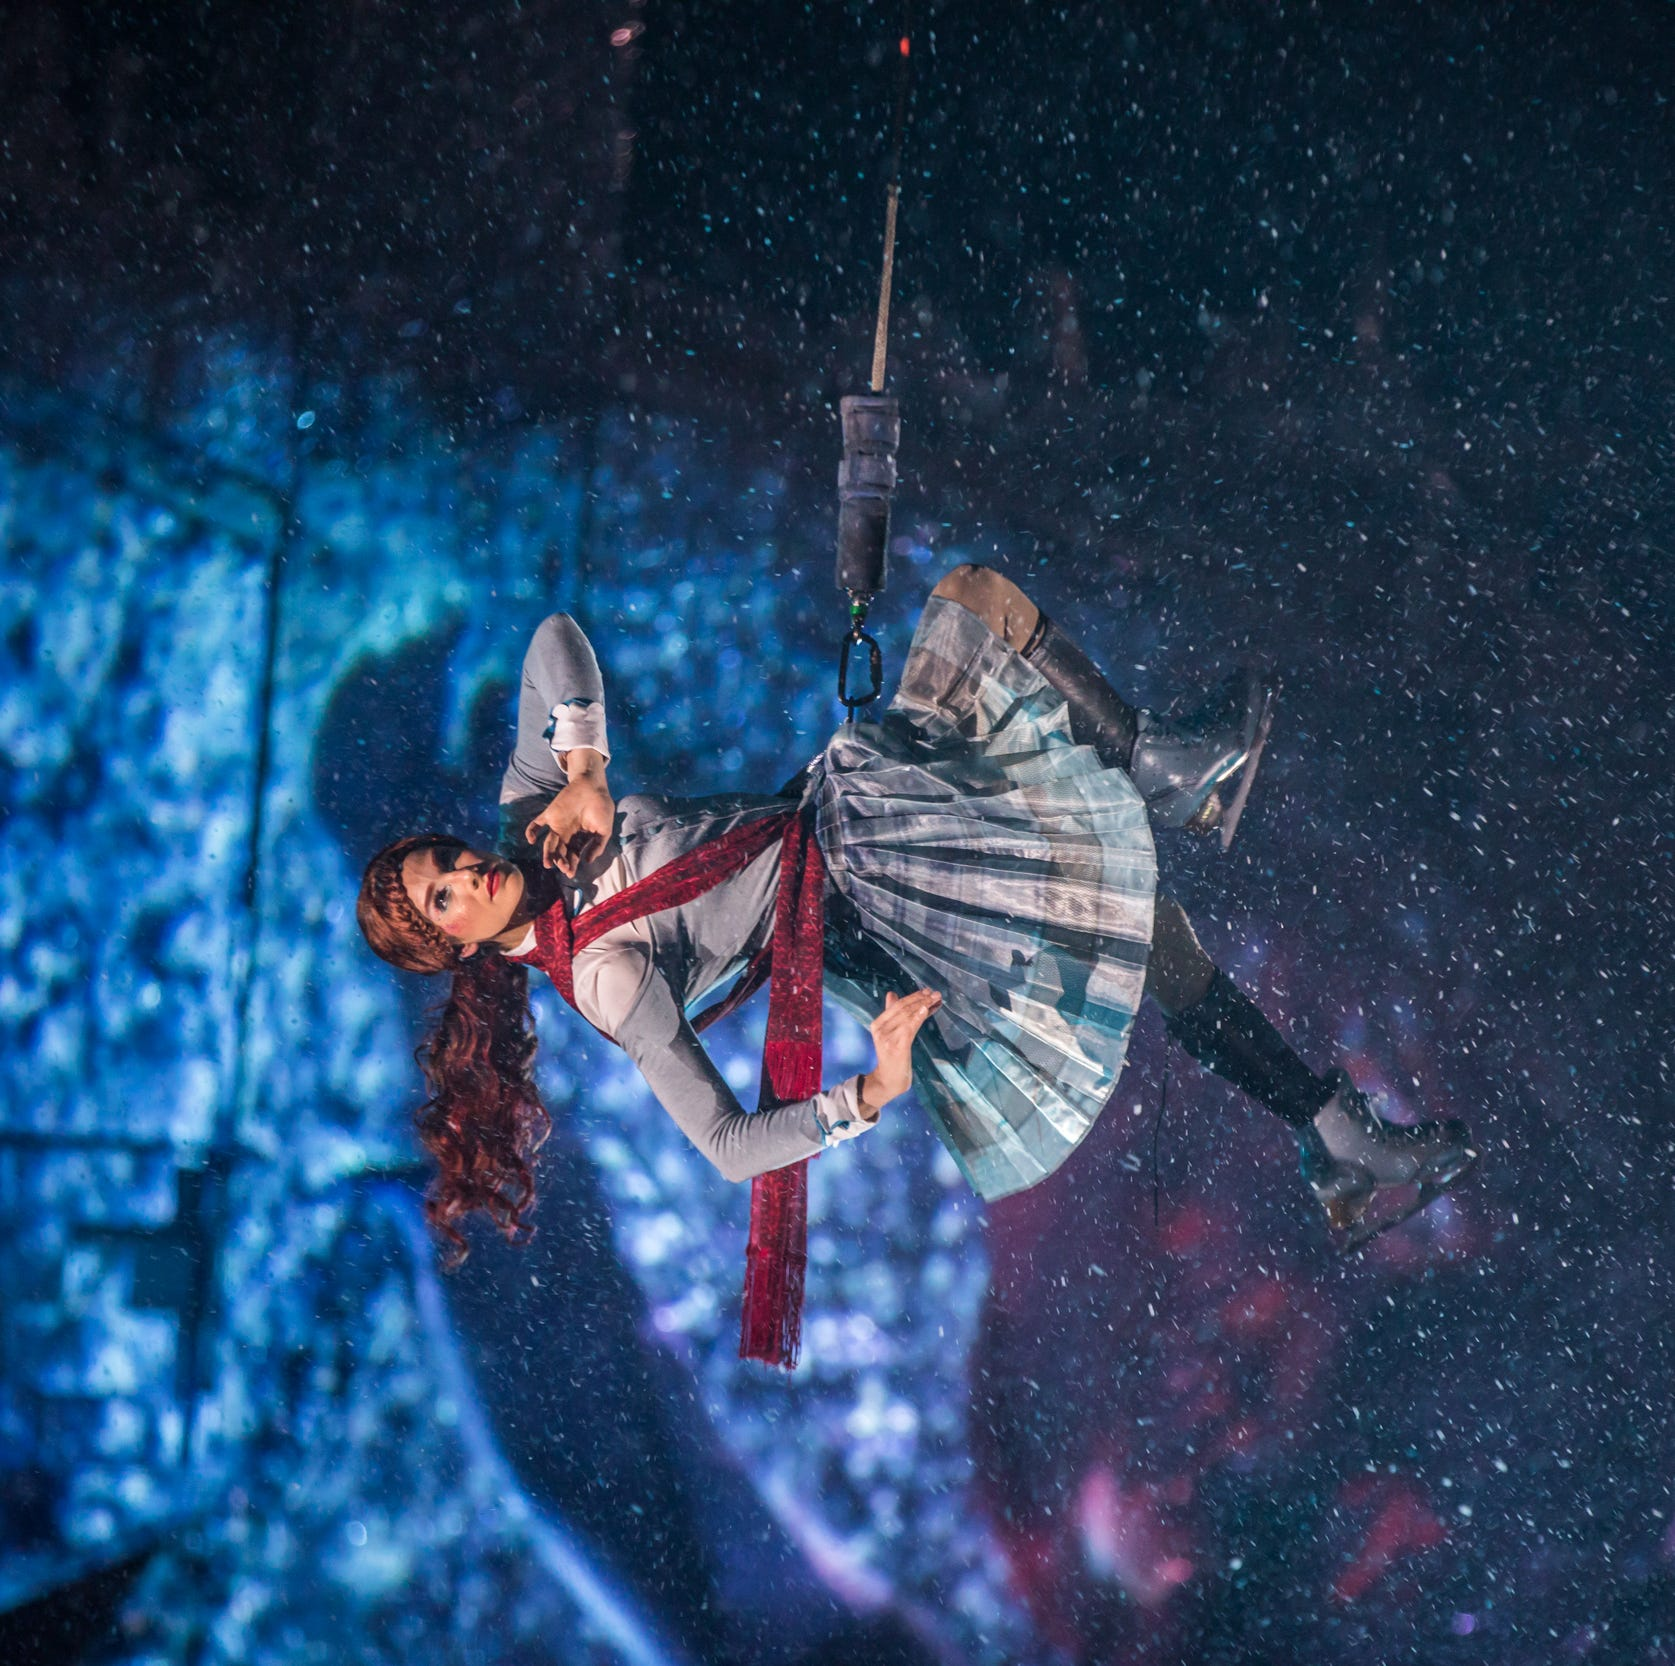 Photos: Cirque du Soleil's 'Crystal'